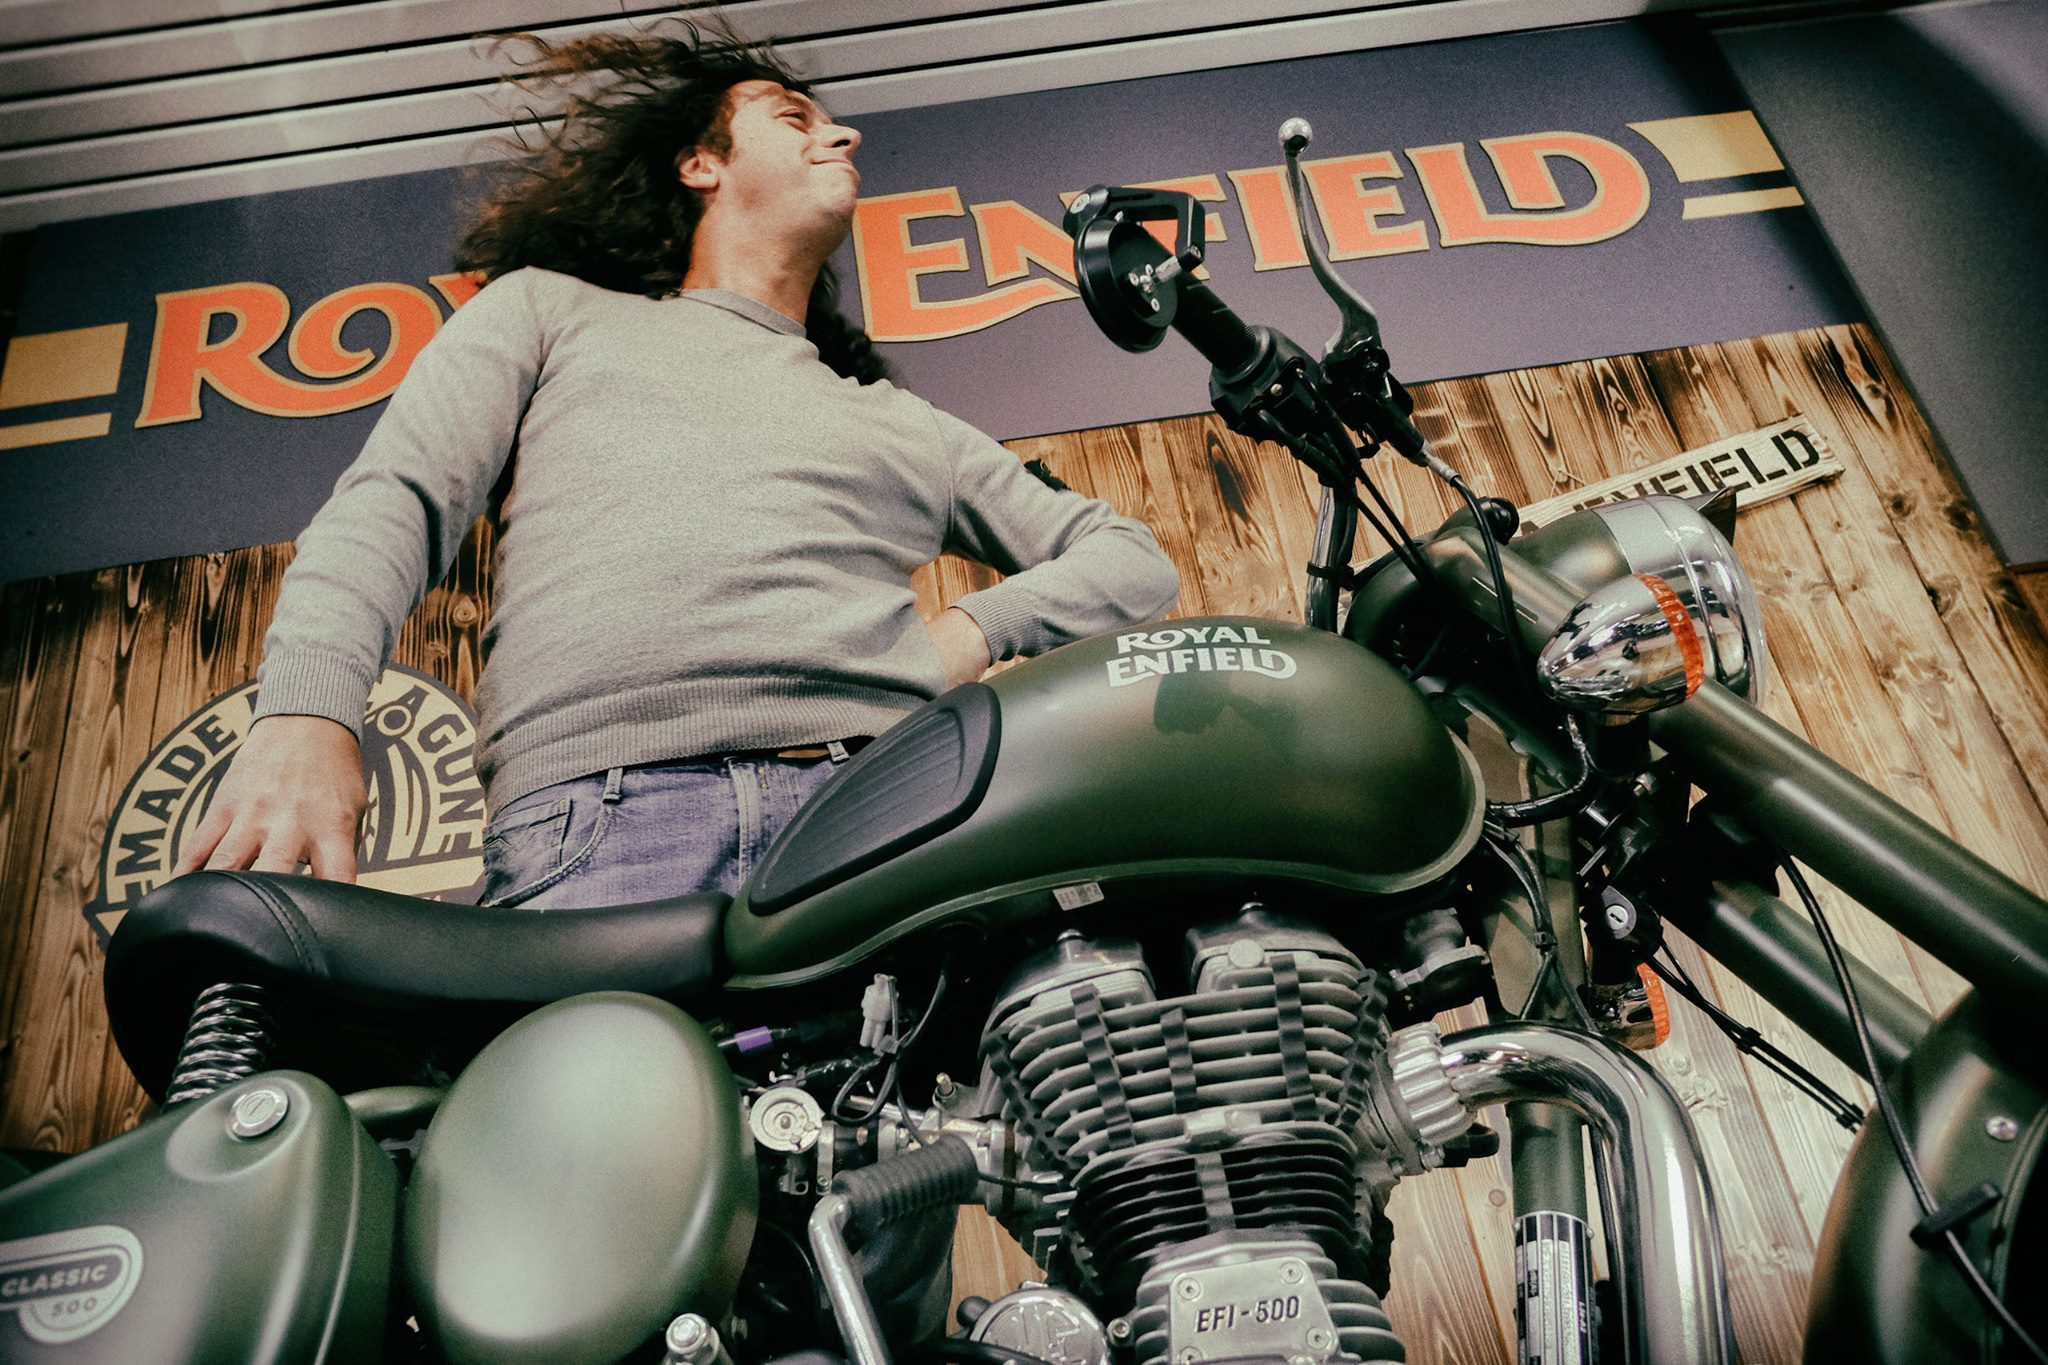 royal-enfield-piacenza-moruzzi-moto-wonderland-campagna-promo-8